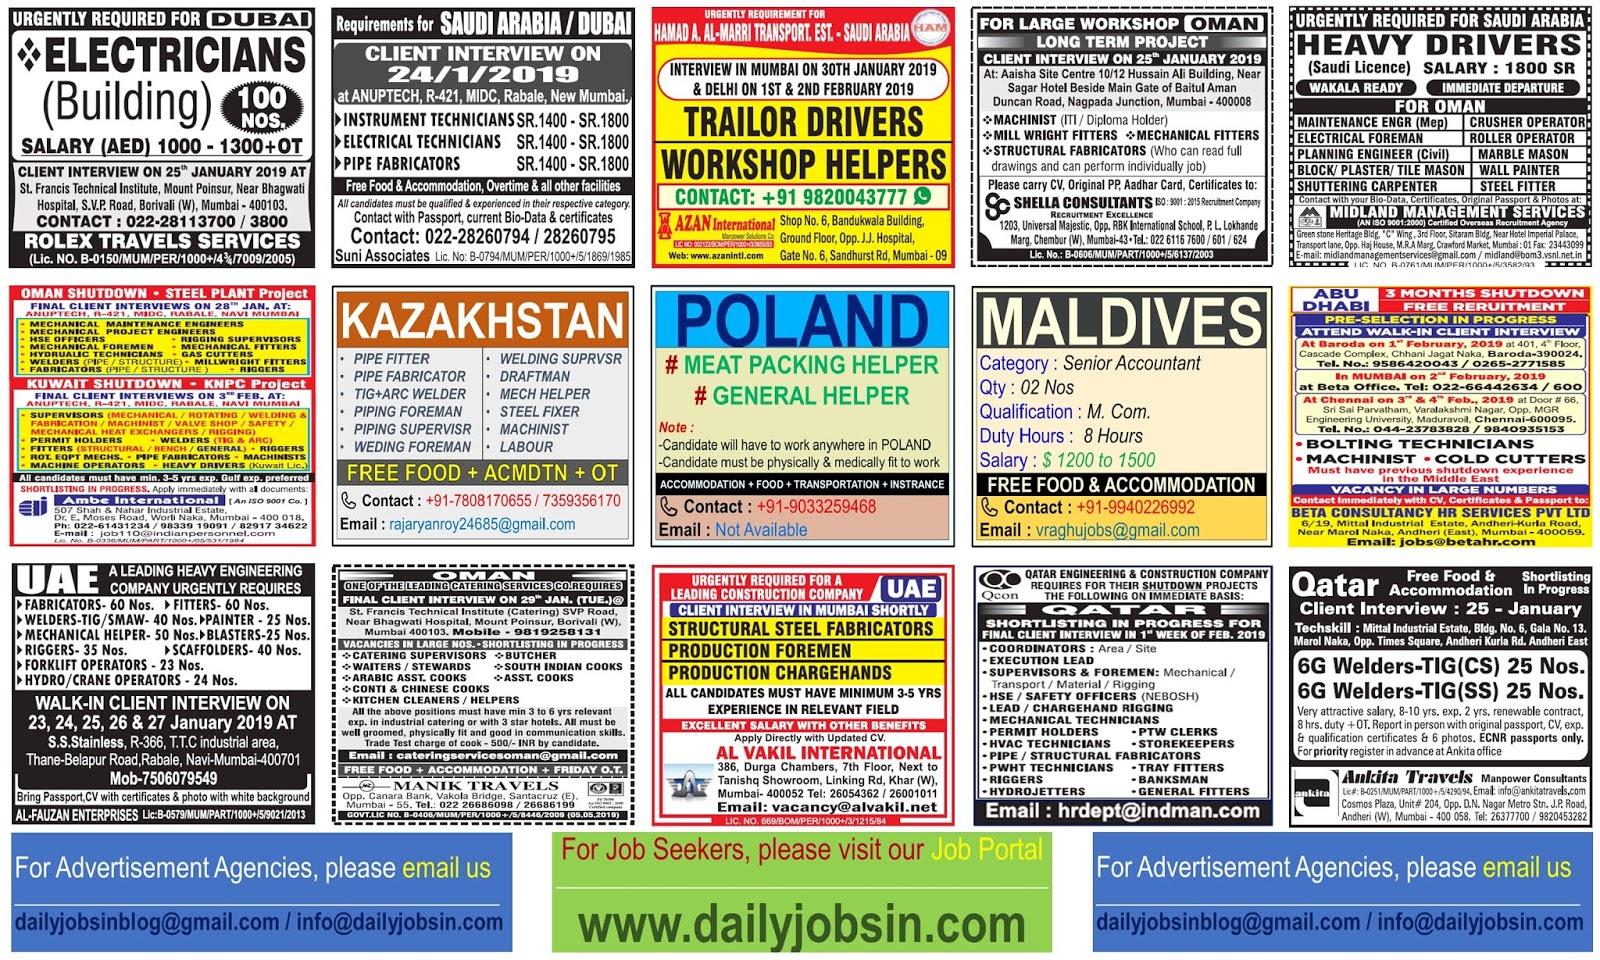 JOBS IN POLAND - KAZAKHSTAN - MALDIVES - GULF COUNTRIES